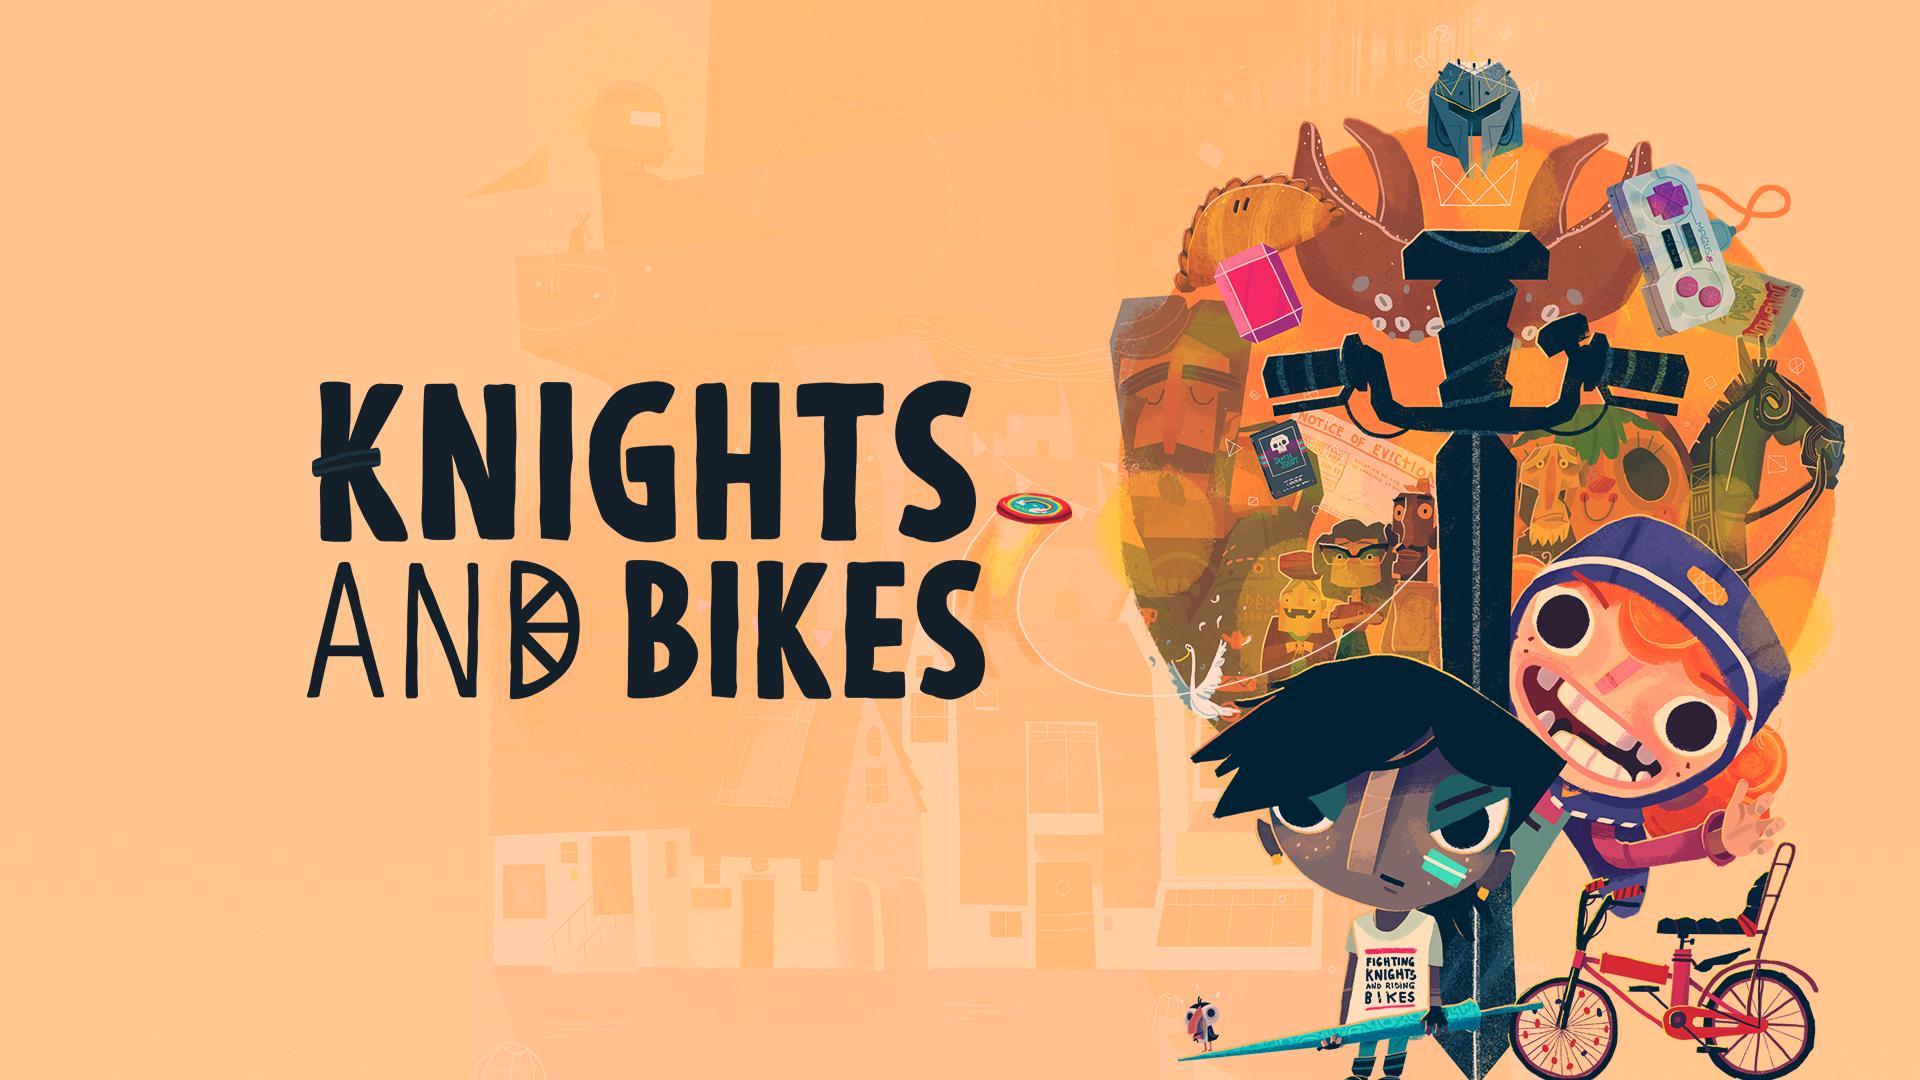 knights and bikes wallpaper